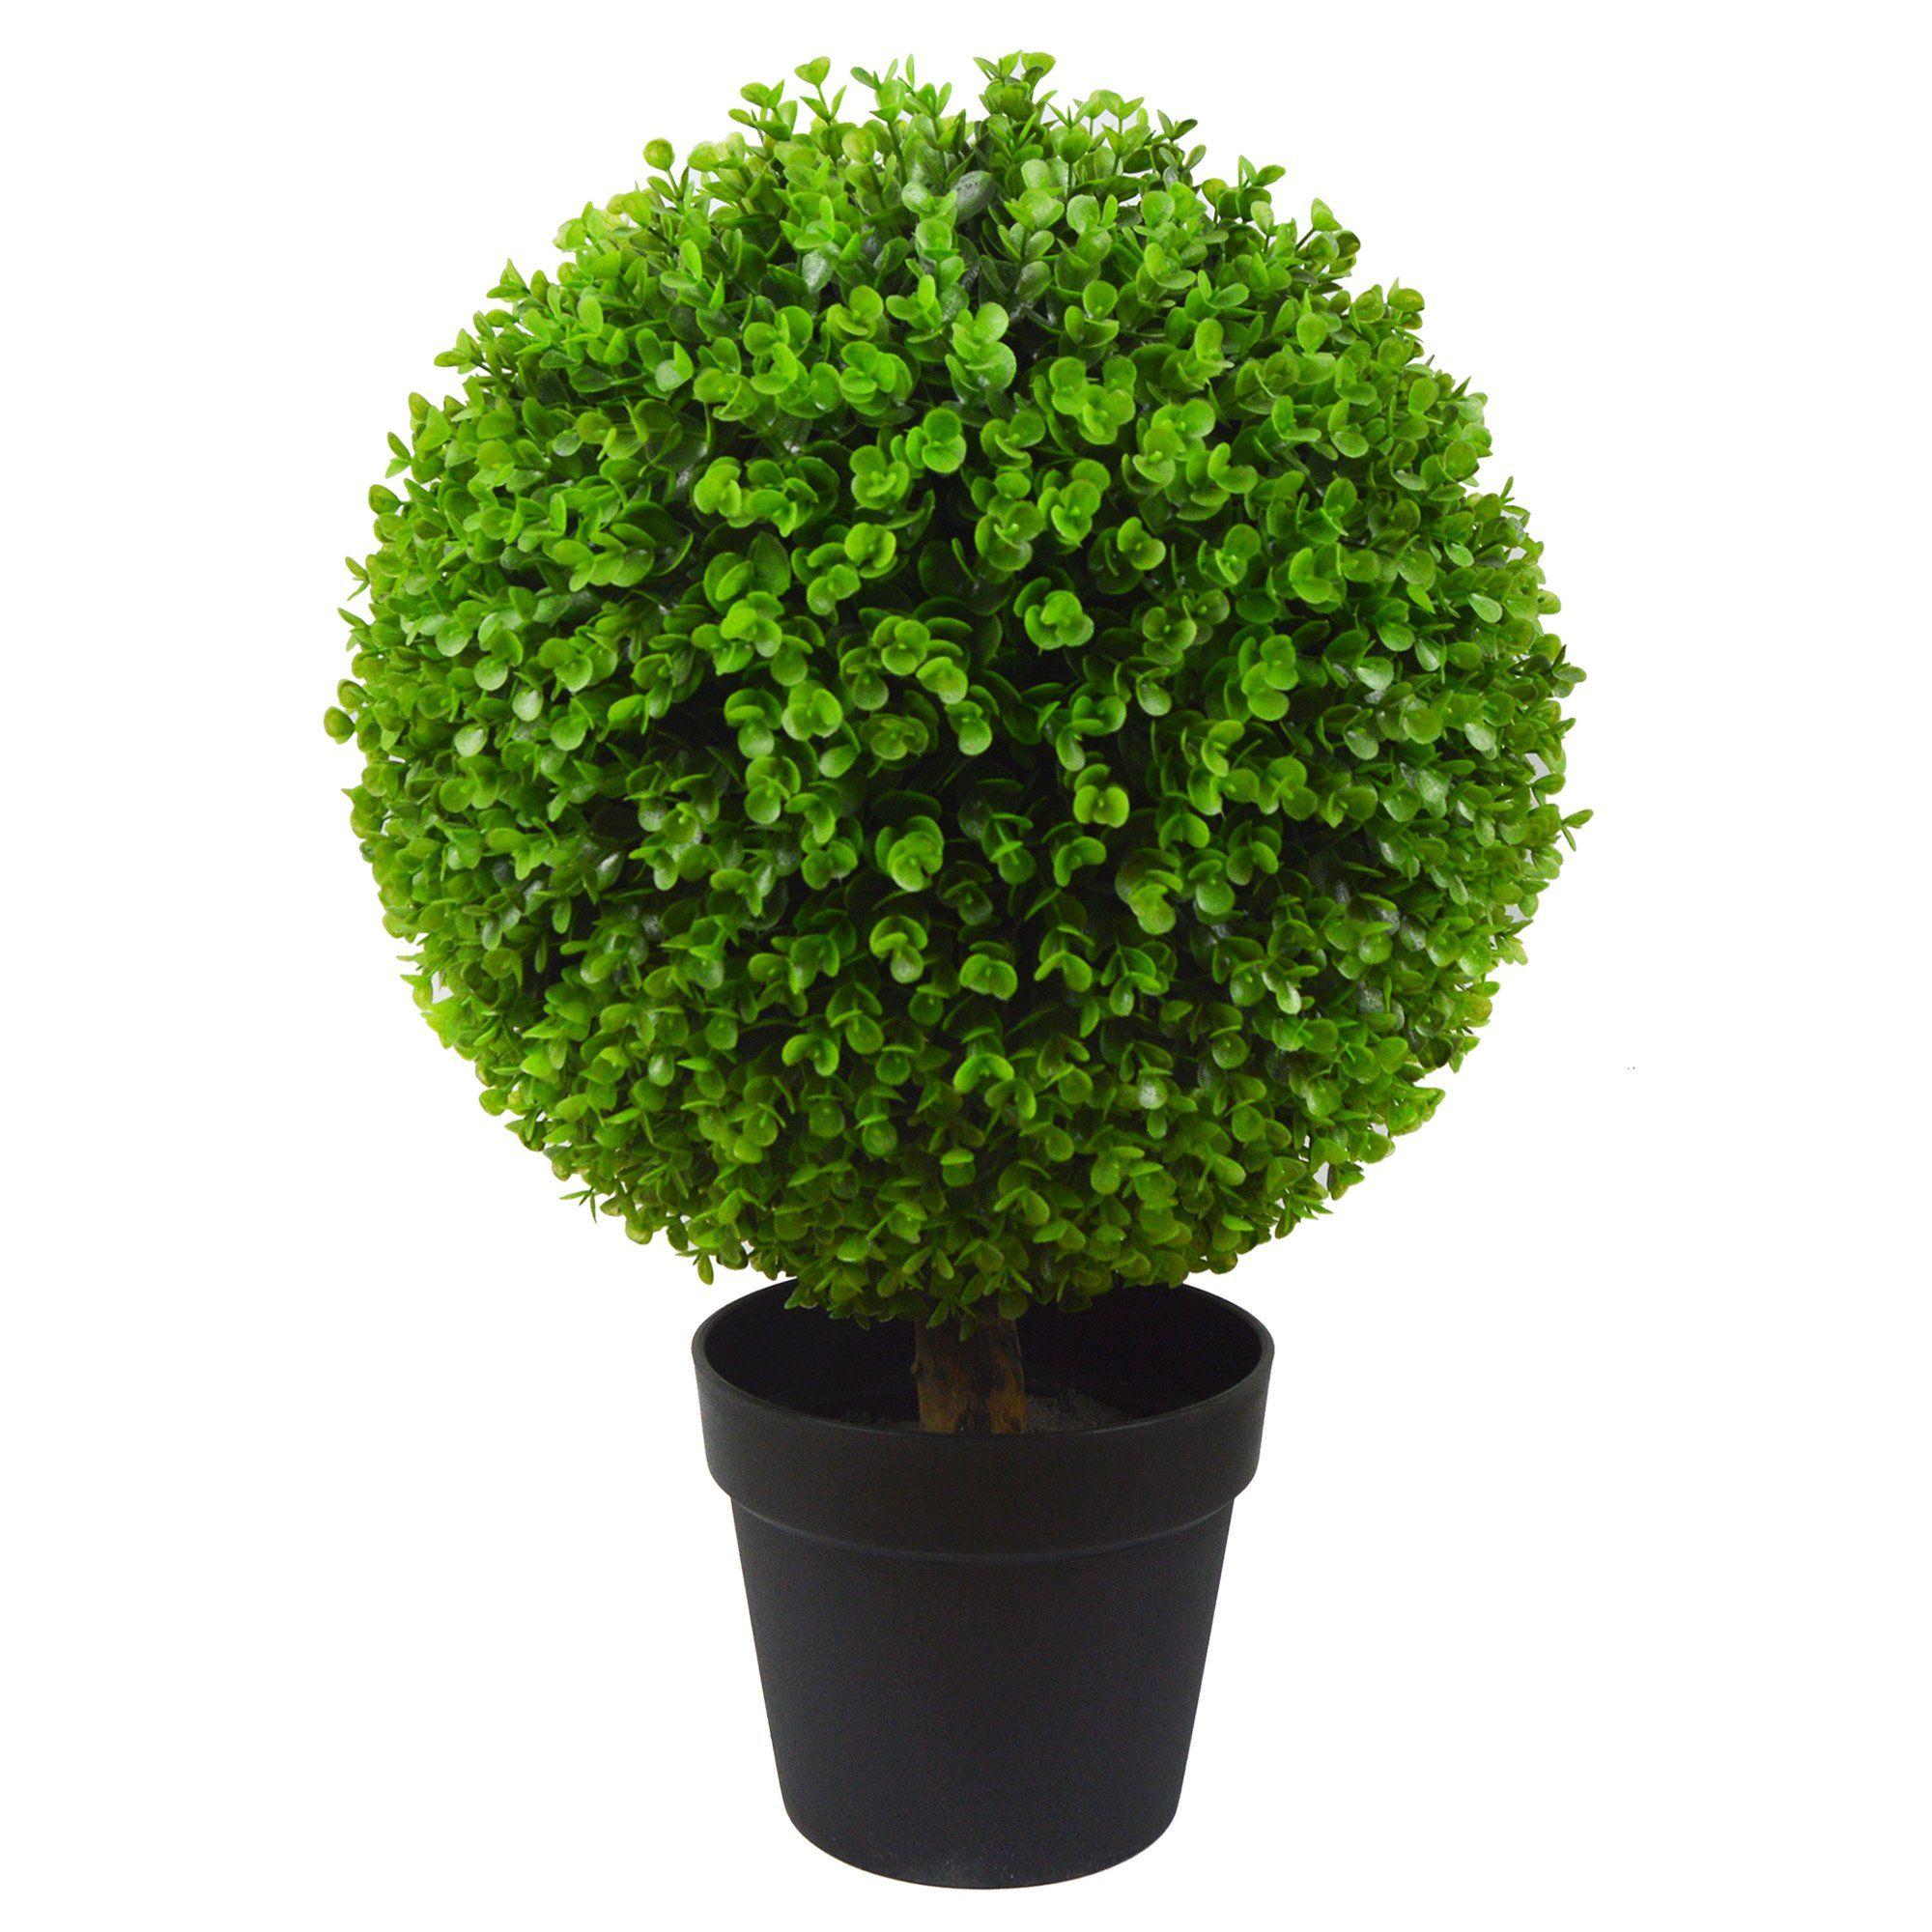 Antigreen boxwood artificial topiary trees